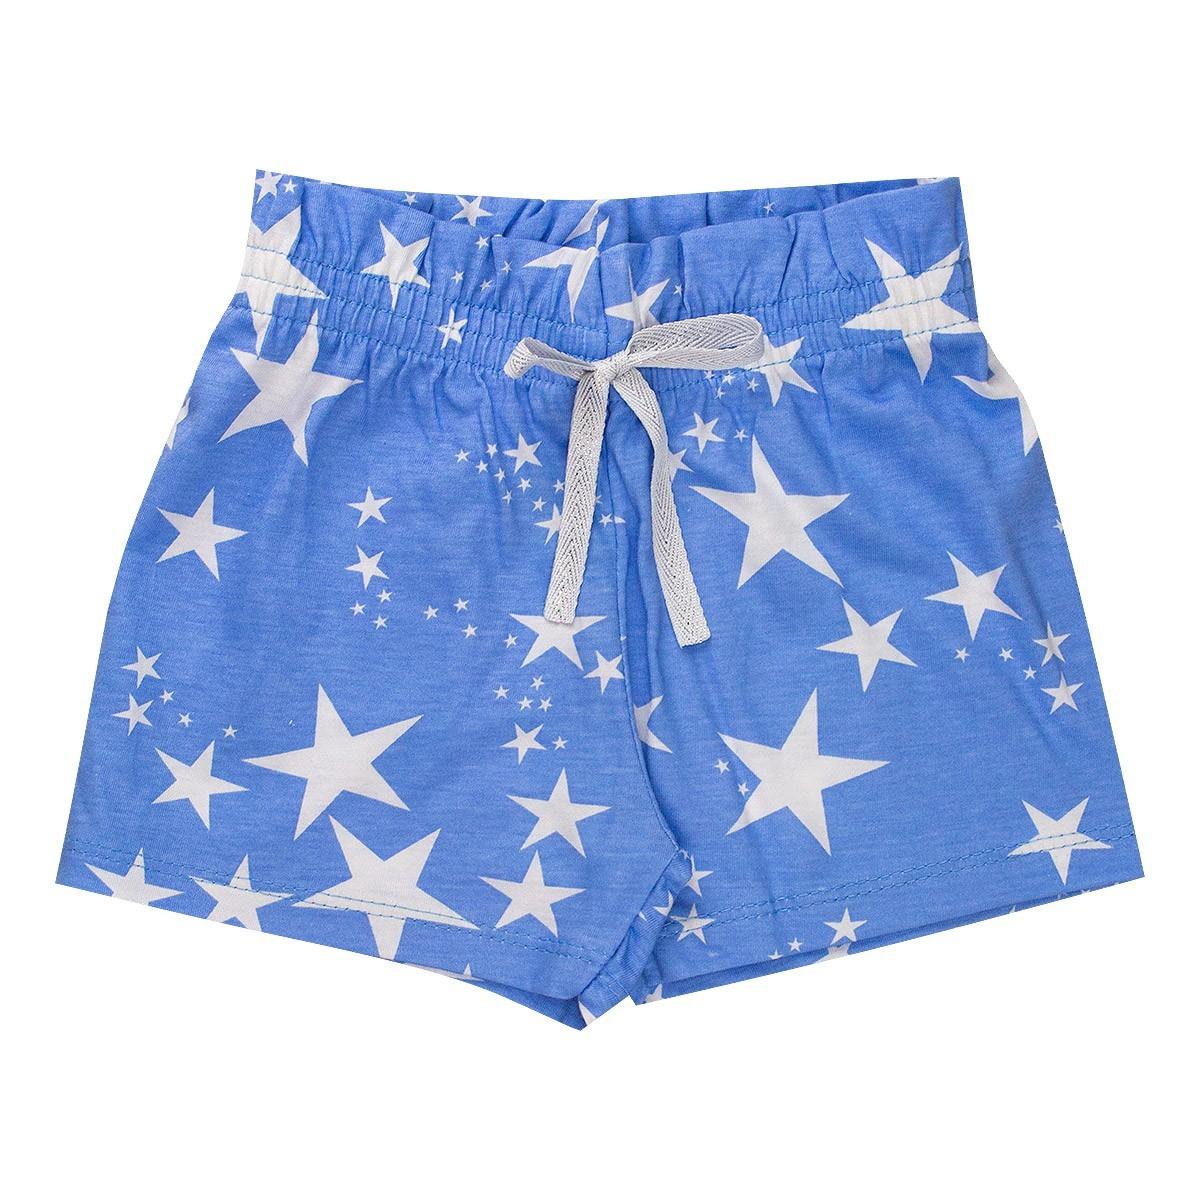 Shorts Fru - Fru Estampado Infantil Menina Azul - Fantoni